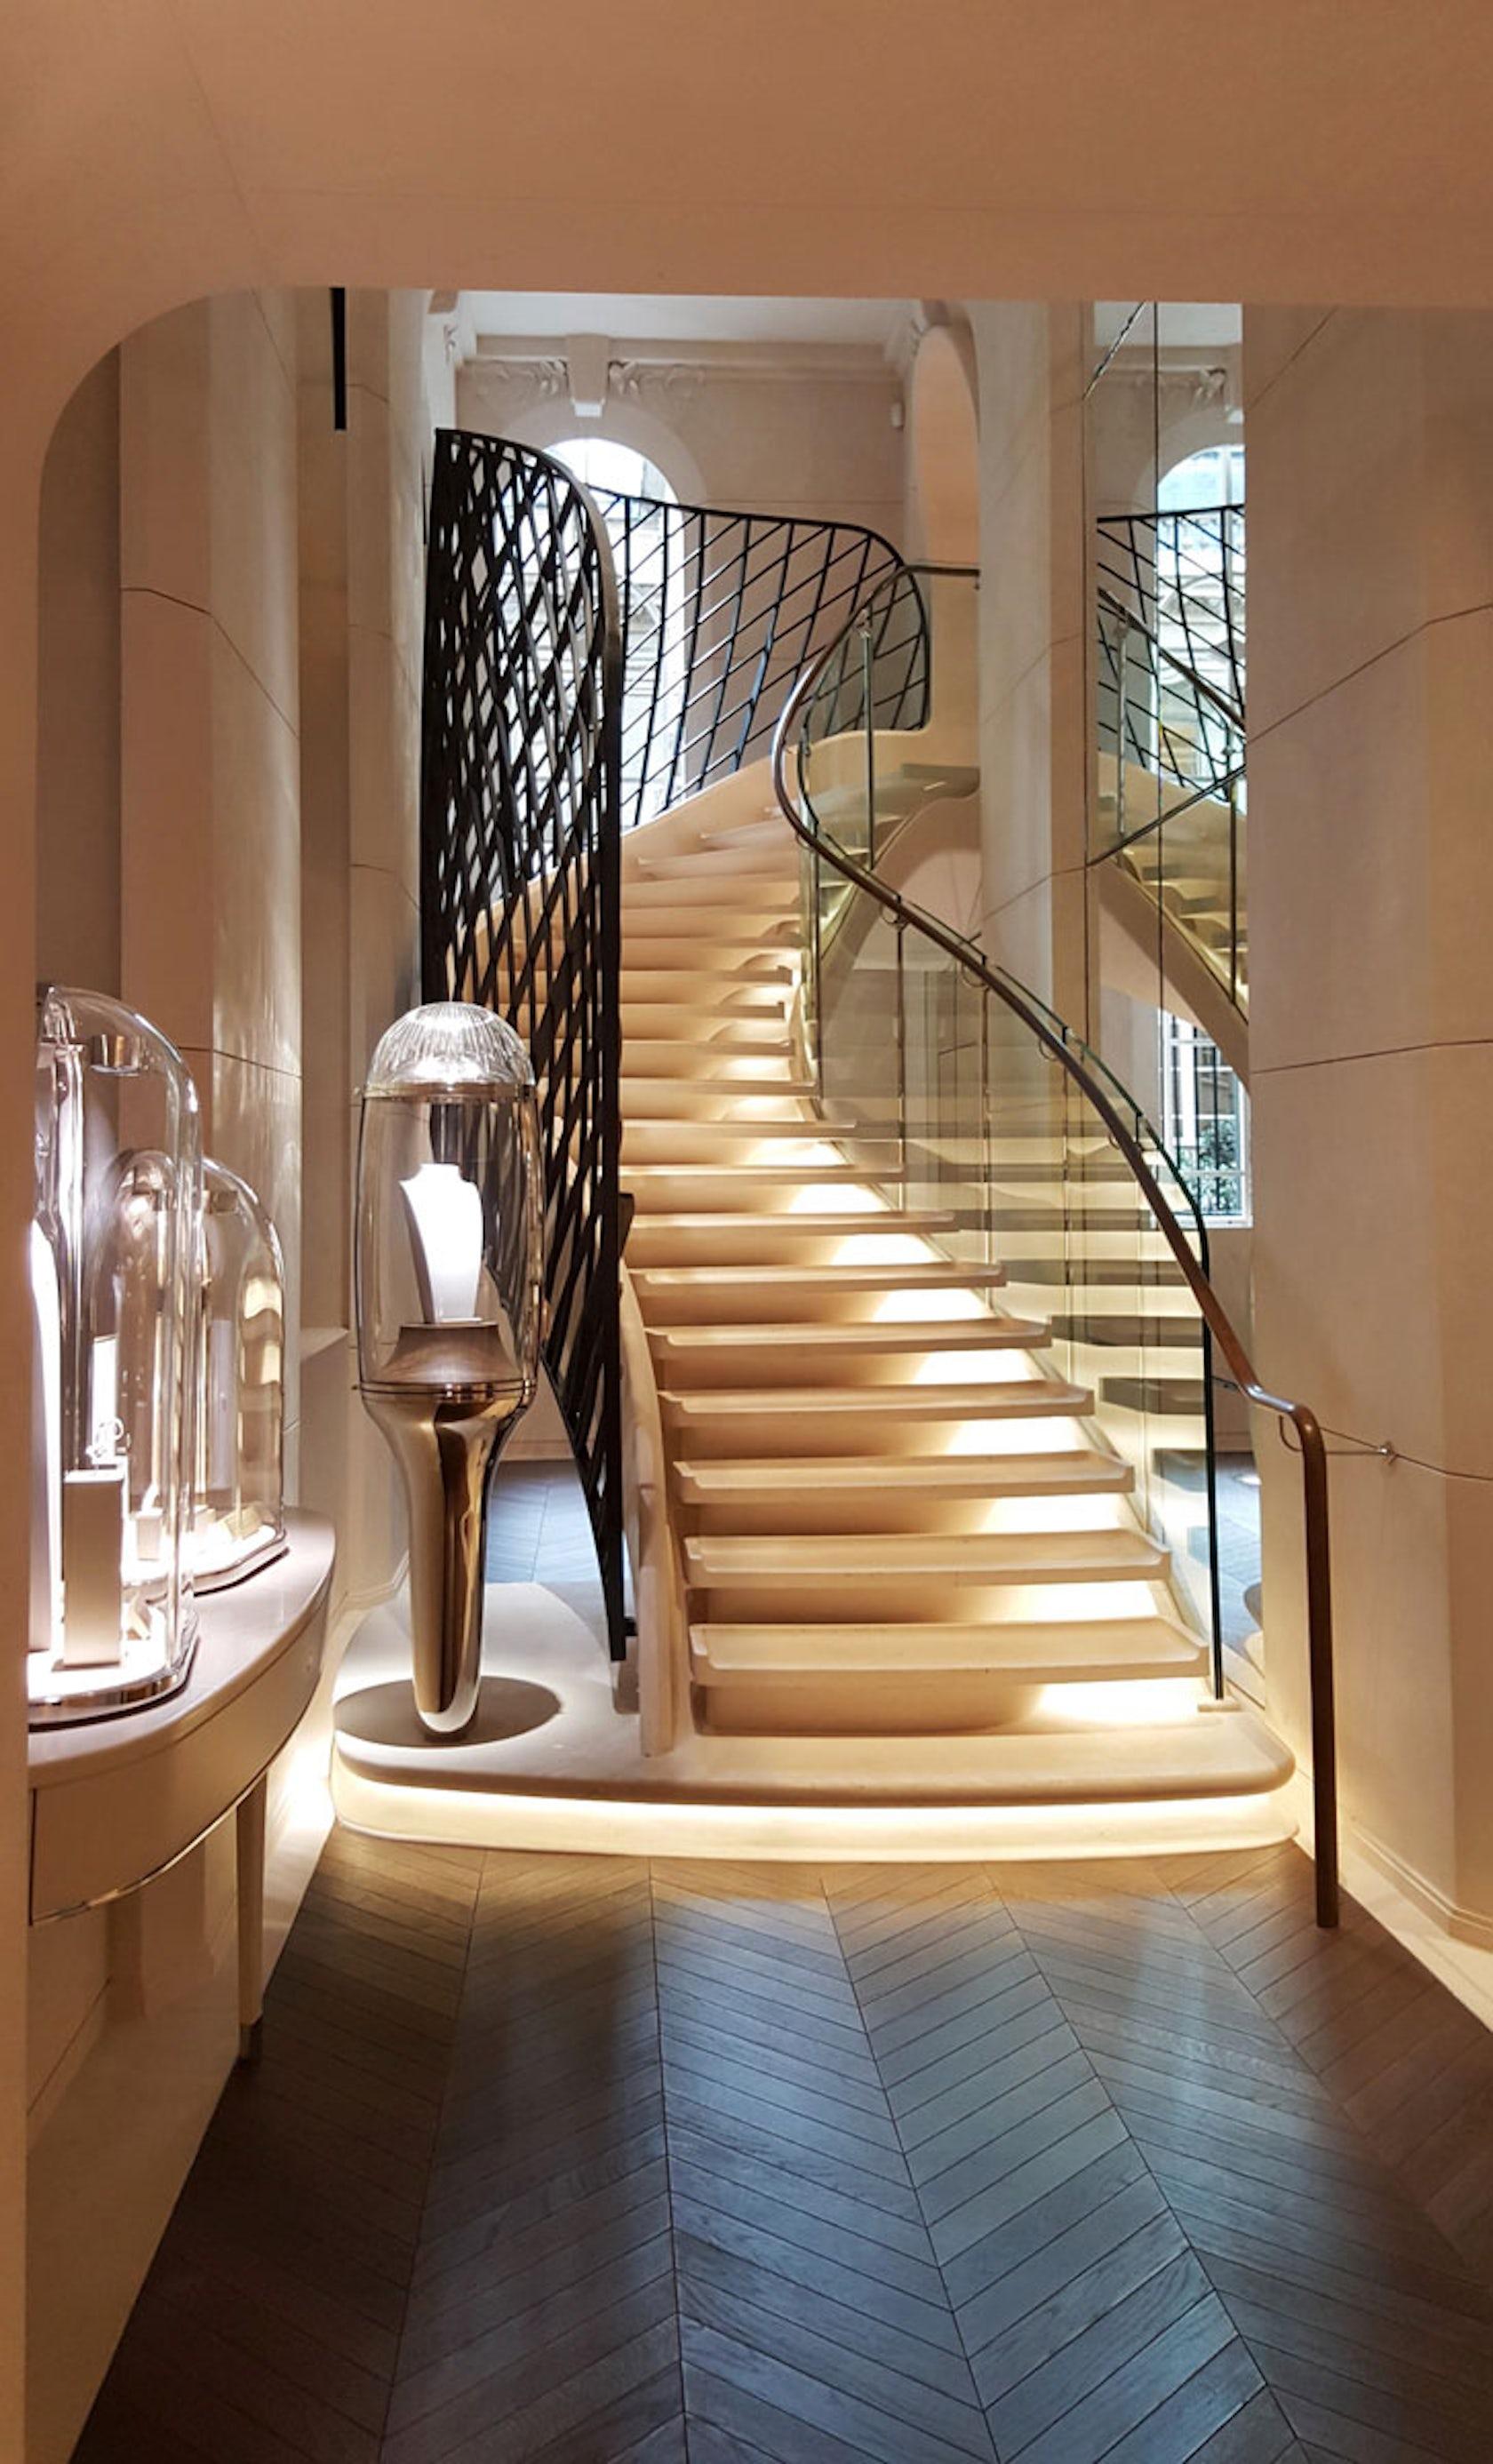 new van cleef arpels showroom in paris architizer. Black Bedroom Furniture Sets. Home Design Ideas